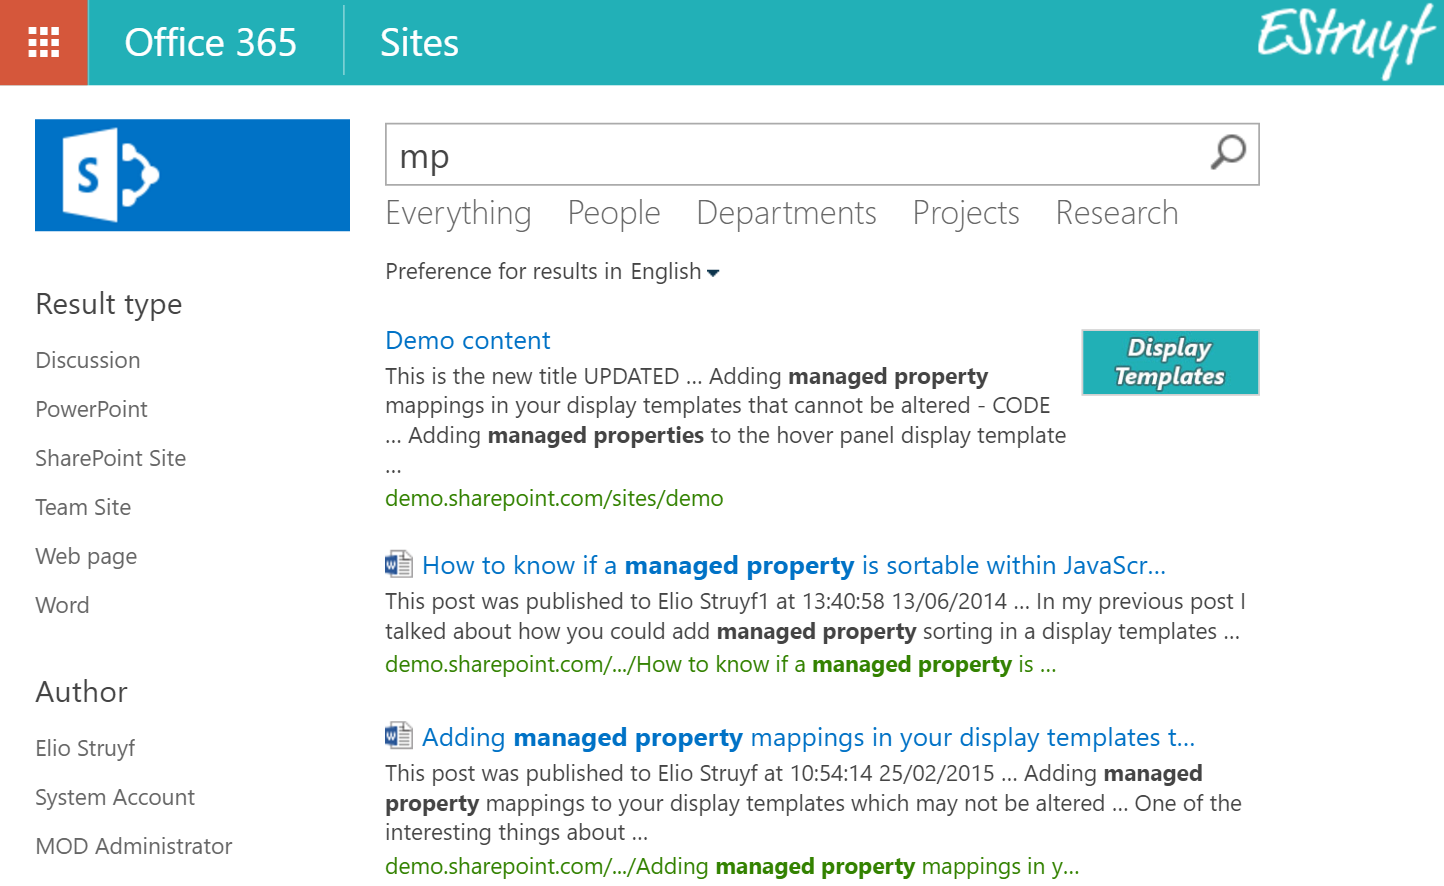 MP Search Query